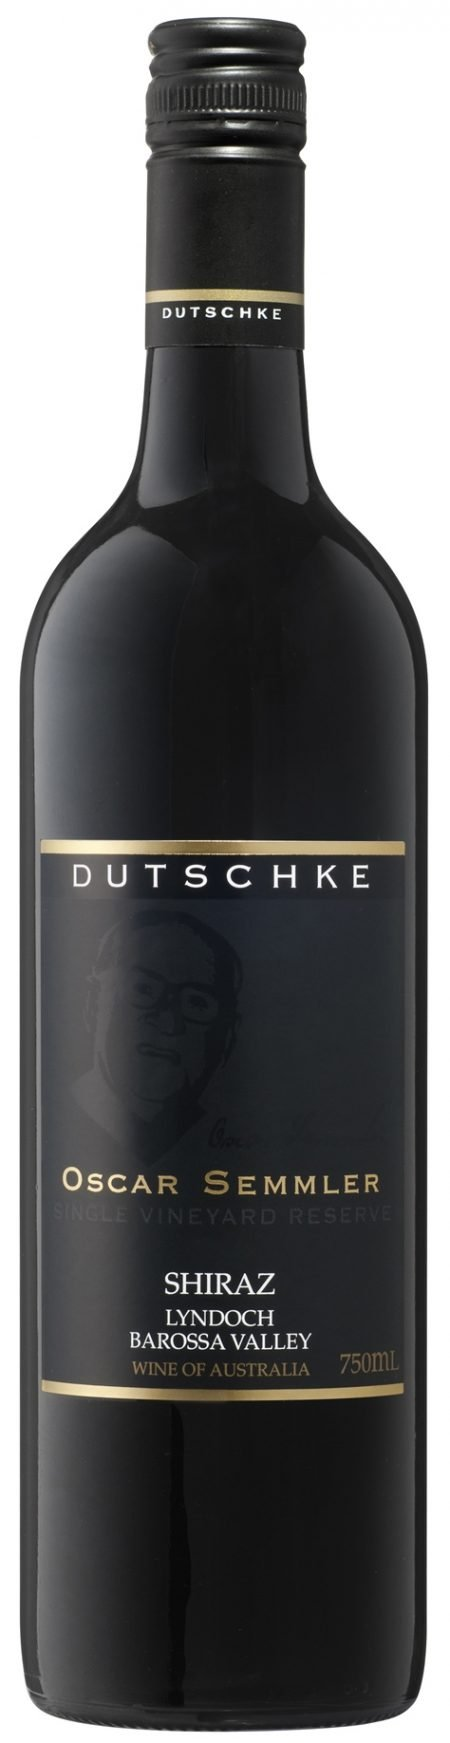 Dutschke 'Oscar Semmler' Shiraz 2004 (1500ml Magnum)-0